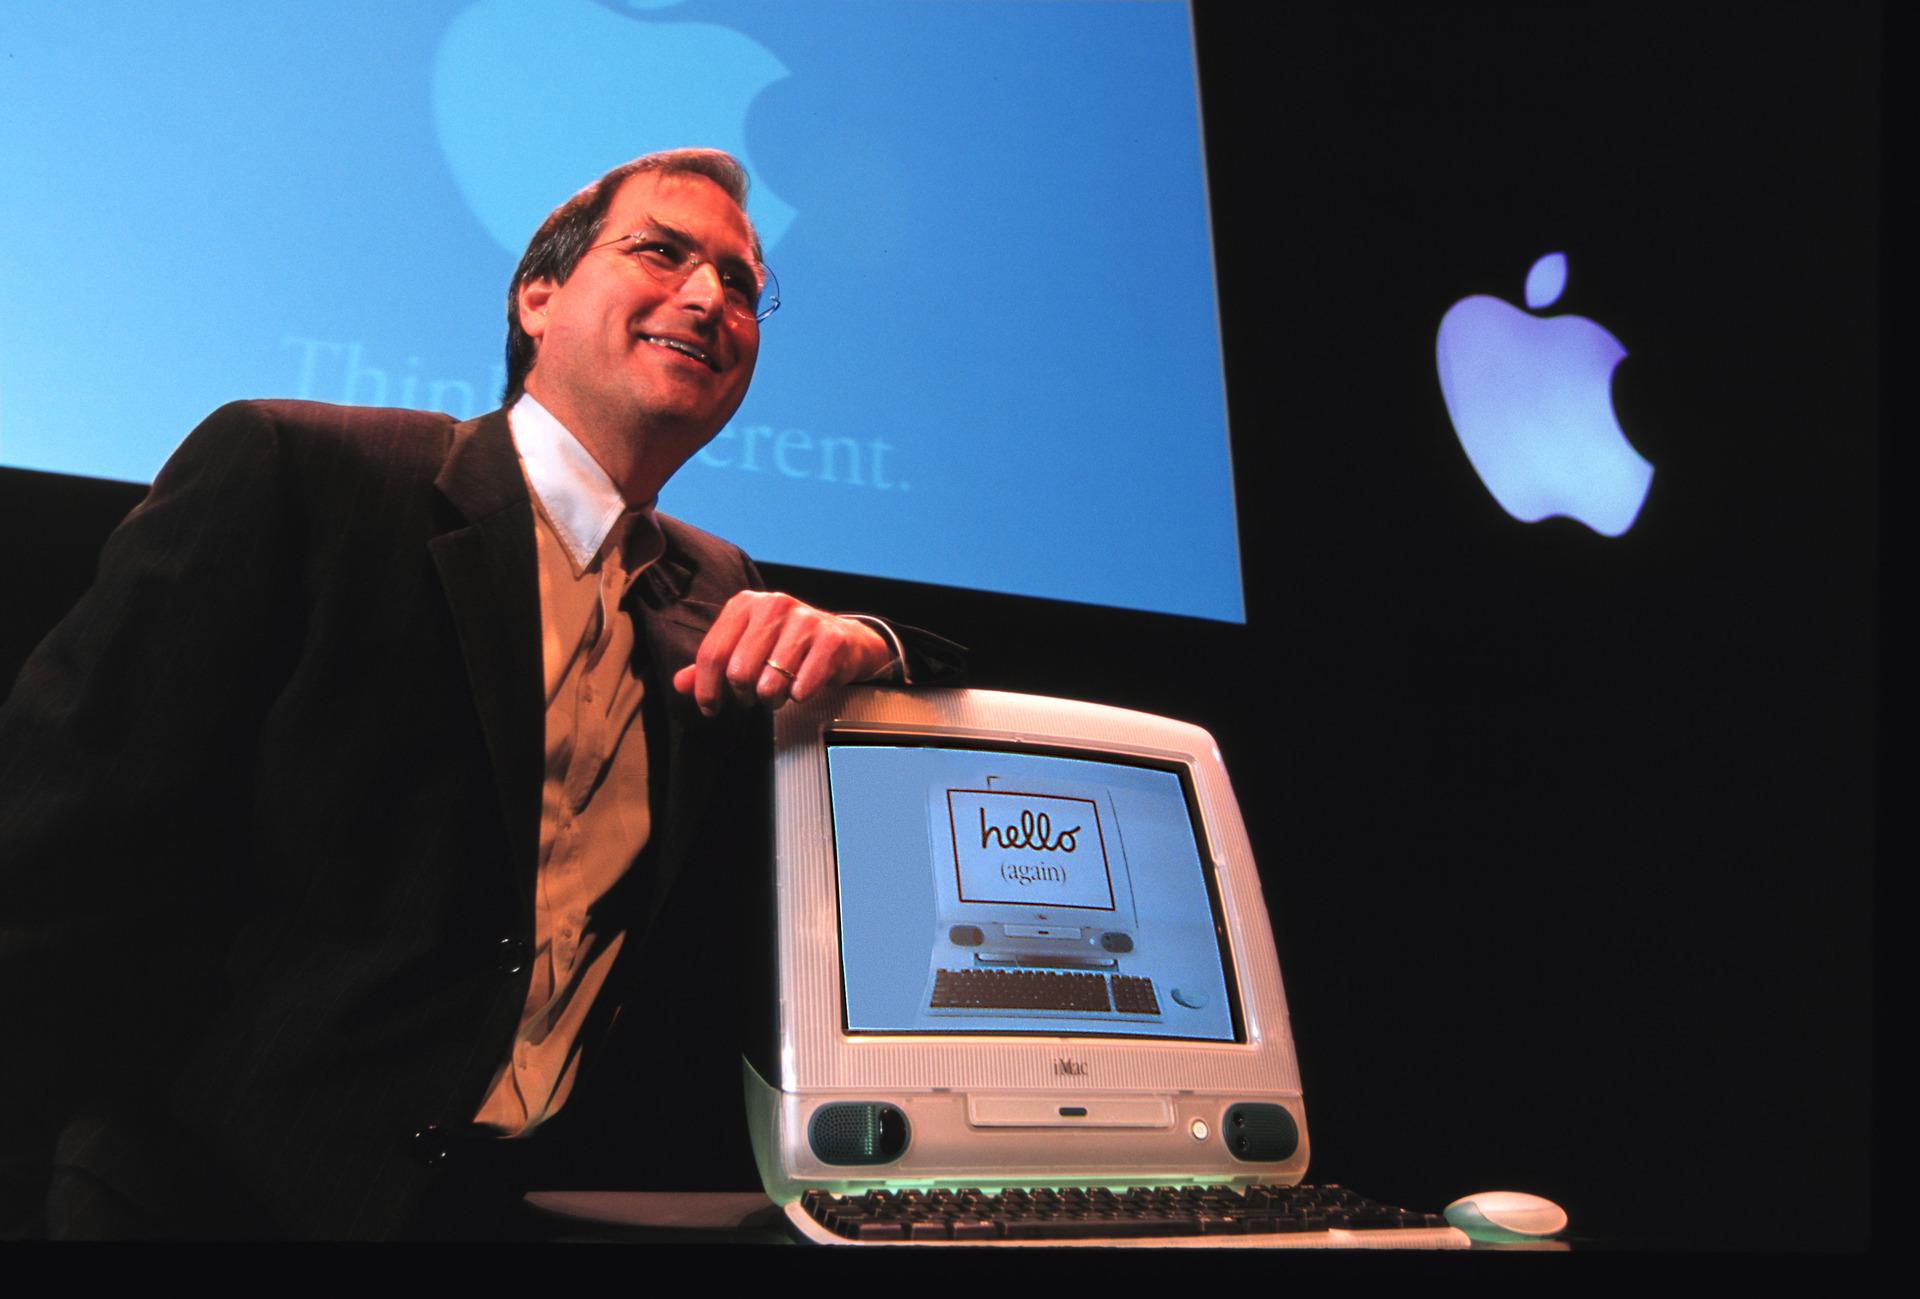 Steve-Jobs-apple-41173_1920_1299